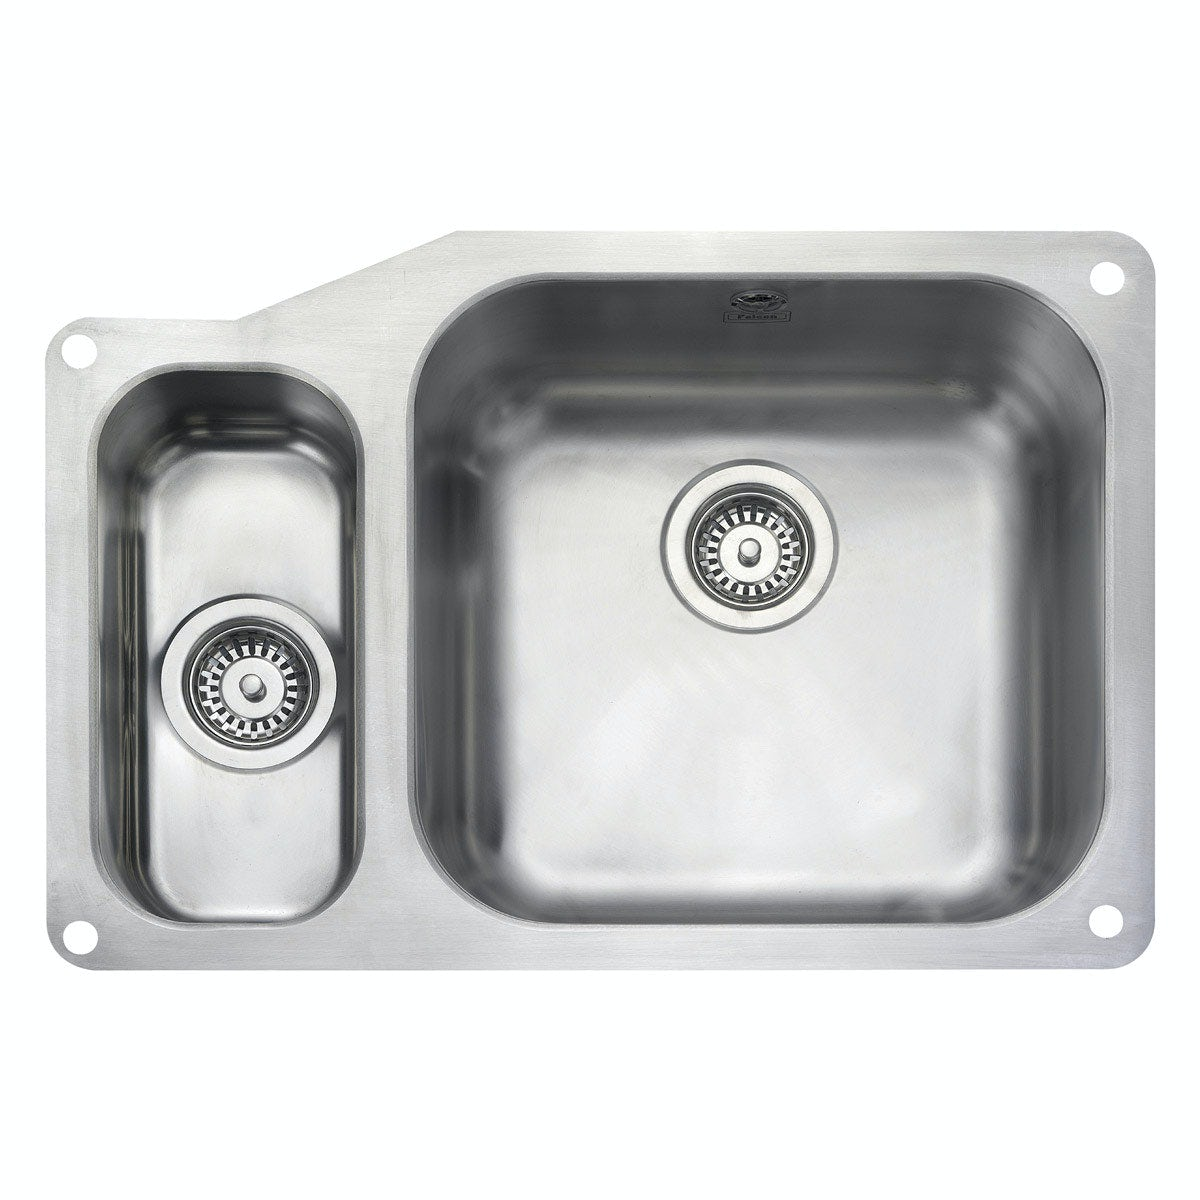 Rangemaster Atlantic Classic 1.5 bowl undermount left handed kitchen sink